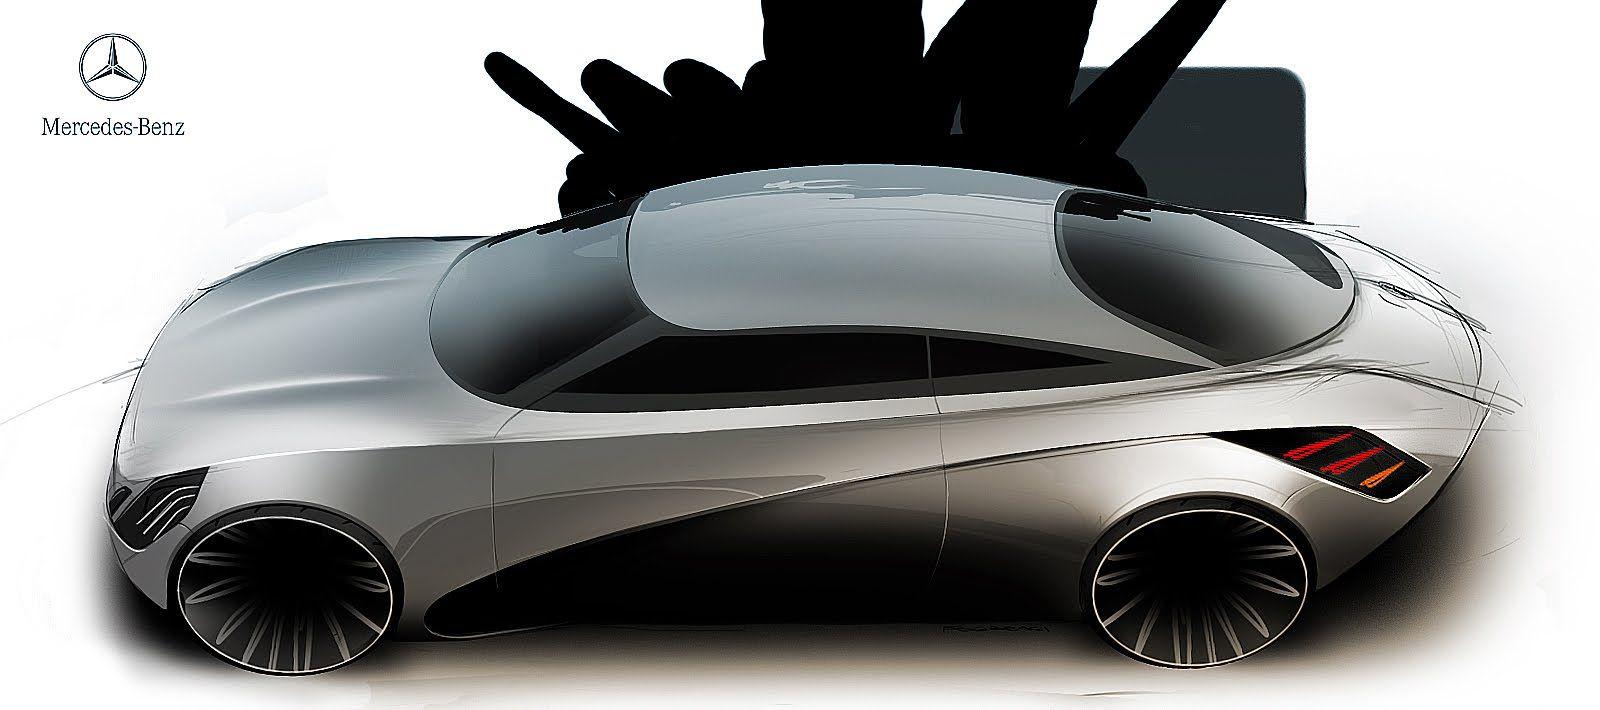 Laszlo Fogarasi Merc Car Sketch Sports Car Car